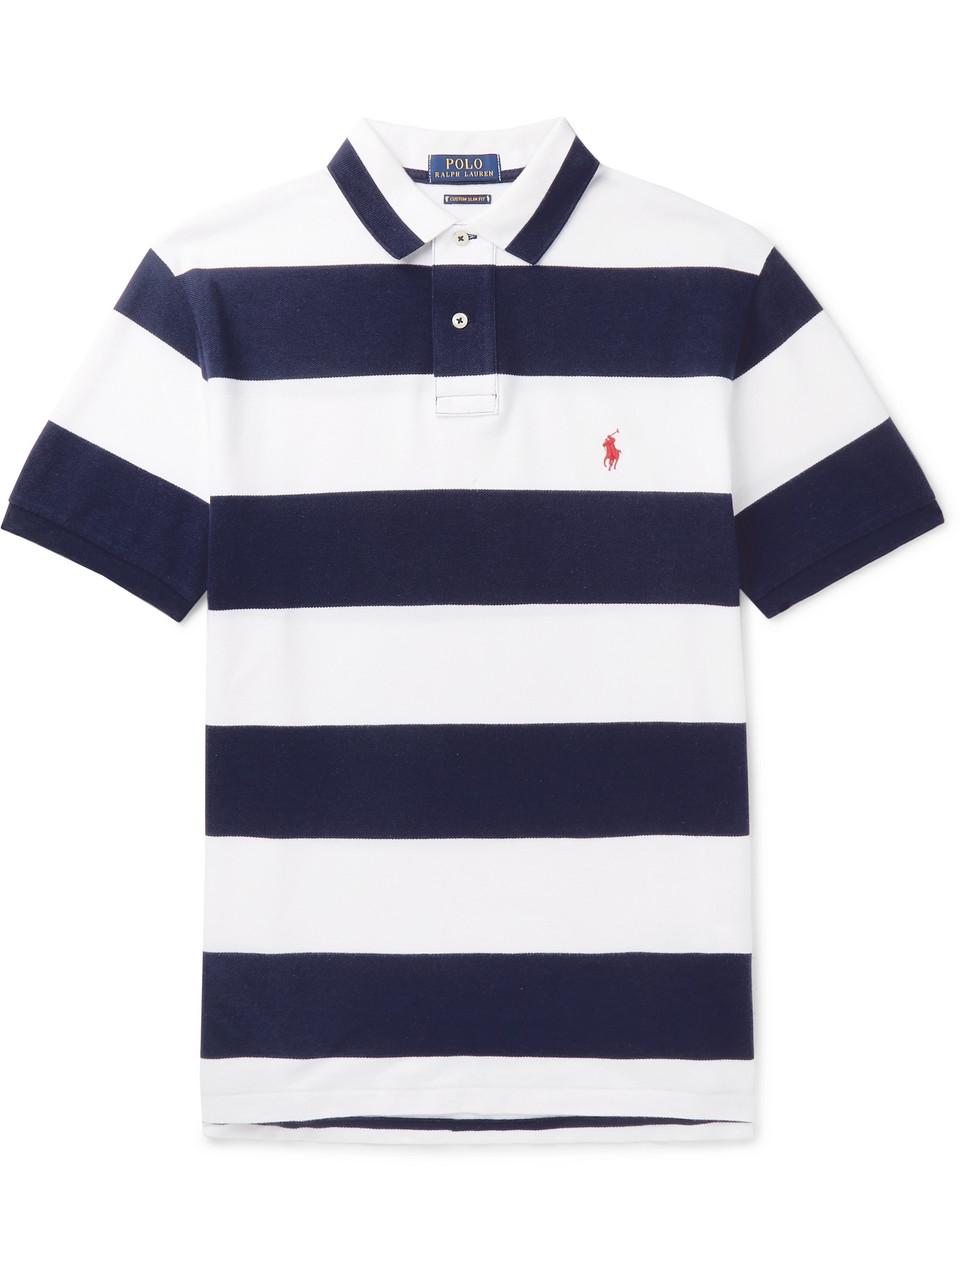 0e52a5ba809 Blue Slim-Fit Striped Cotton-Piqué Polo Shirt   Polo Ralph Lauren ...